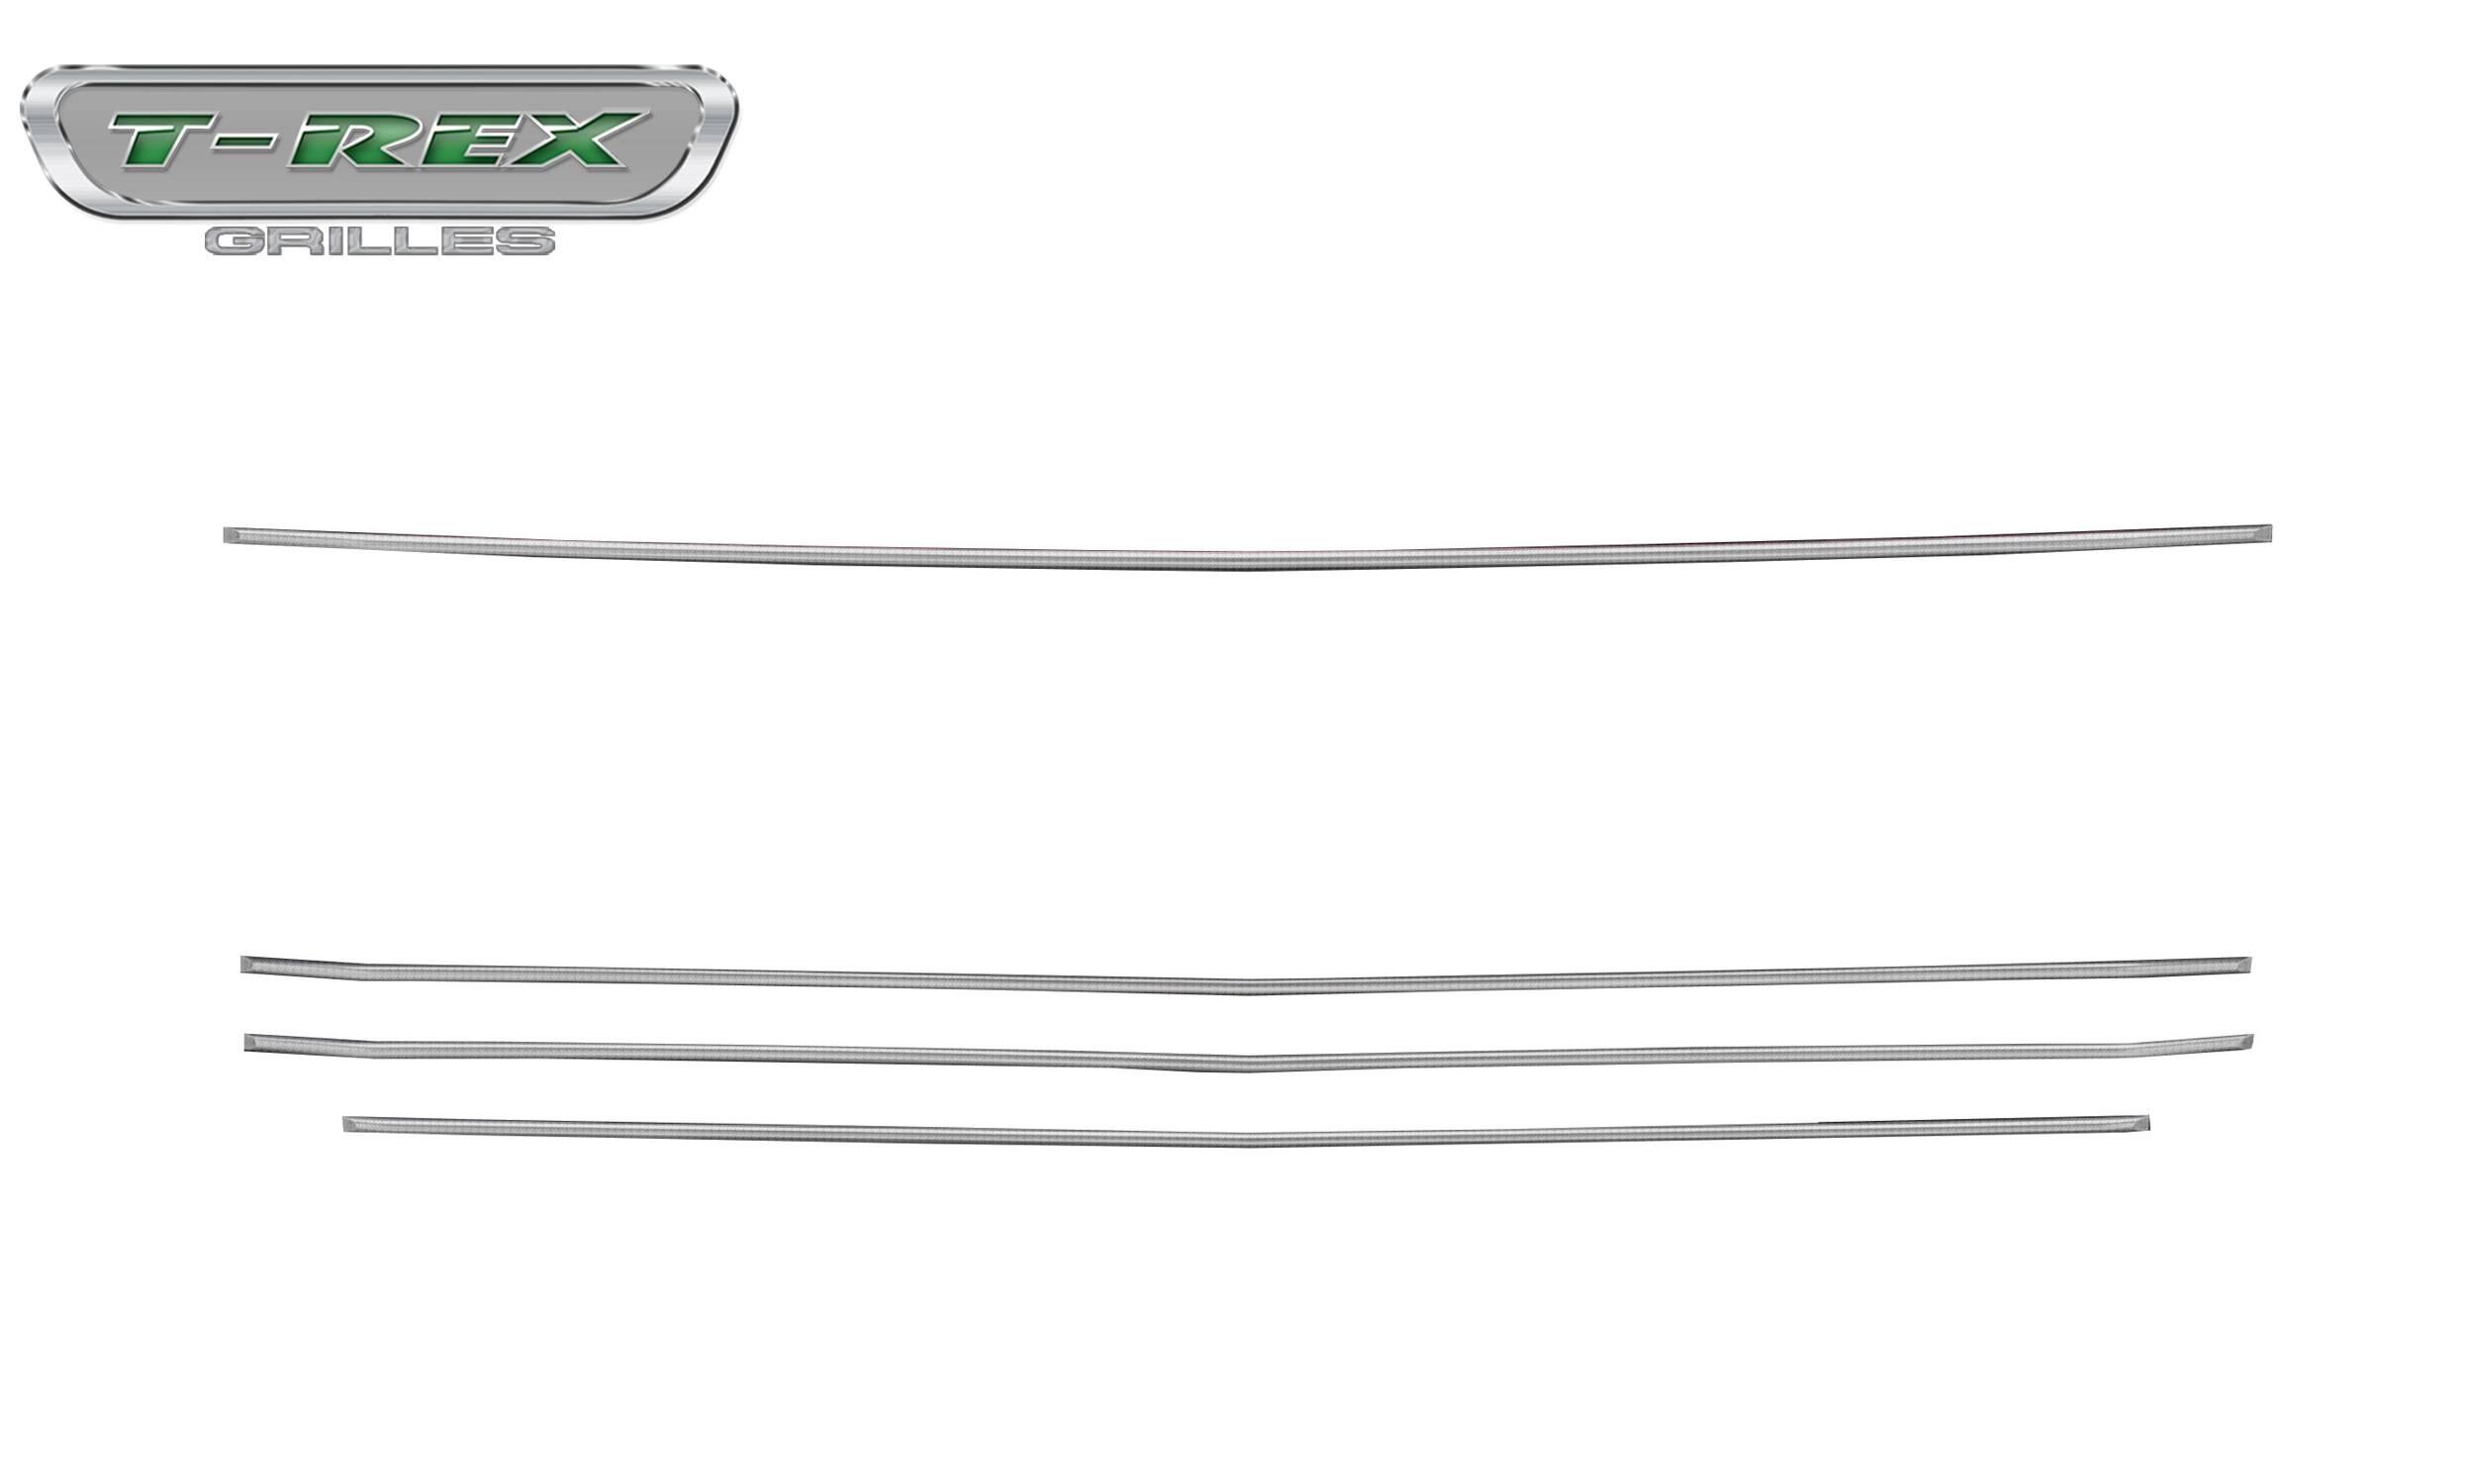 Chevrolet Silverado 1500 2019 Billet Grille, Horizontal Round, Brushed, Aluminum, 4 Pc, Overlay - Pt #6211233